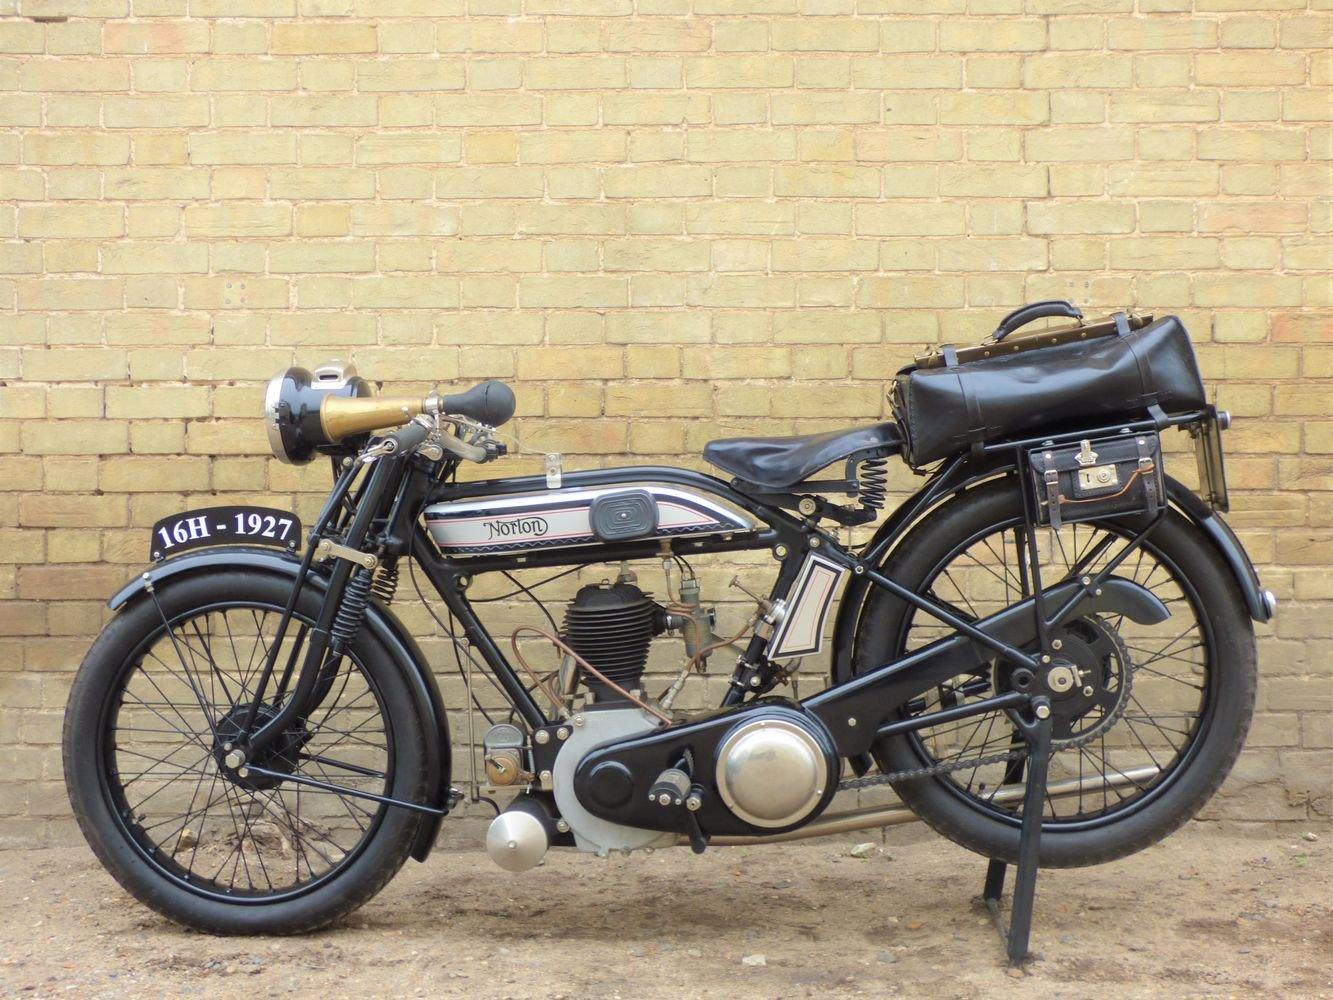 1927 Norton 16H 490cc For Sale (picture 2 of 6)